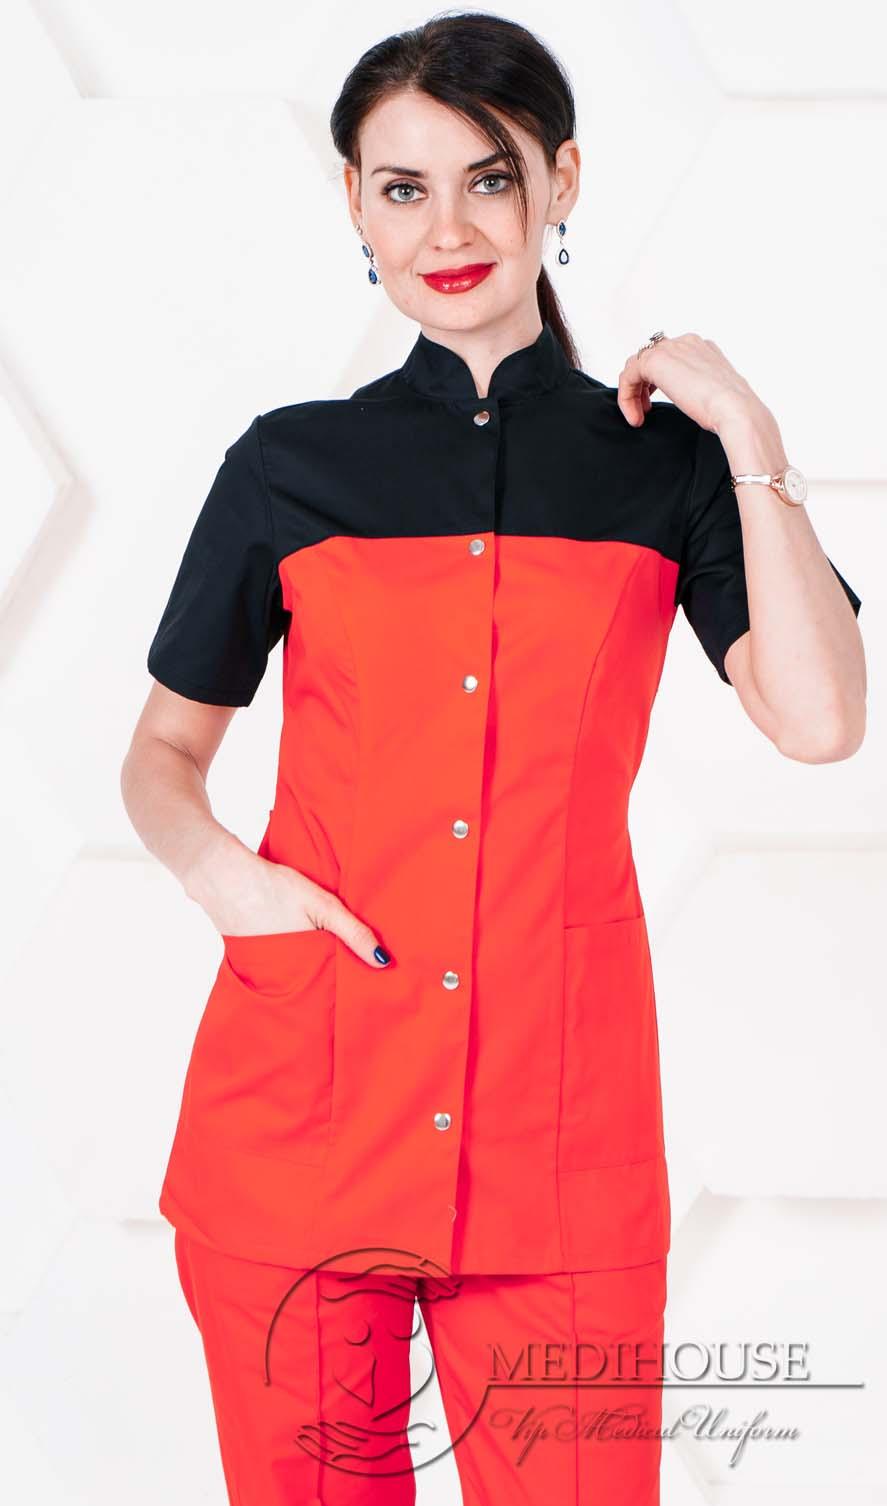 Женский медицинский блузон мод. 1.2.1 R&B